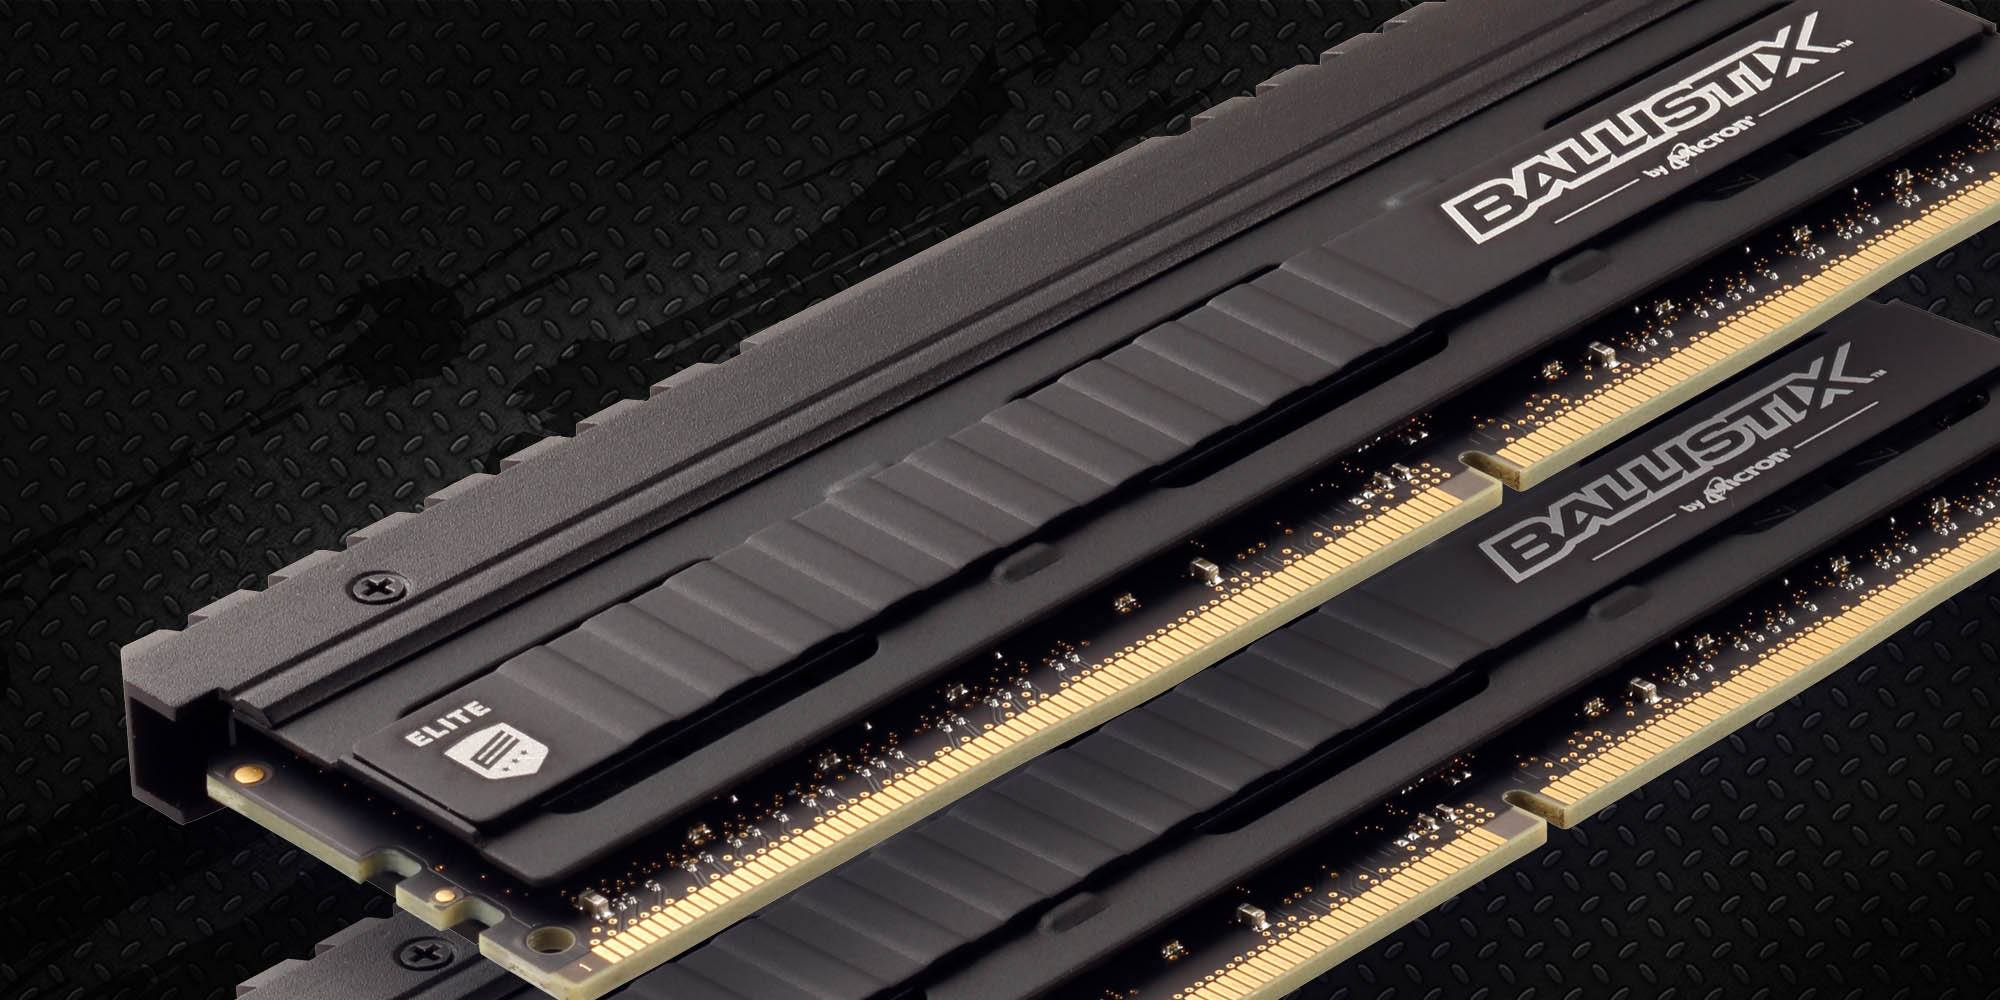 Ballistix Elite DDR4 Memory